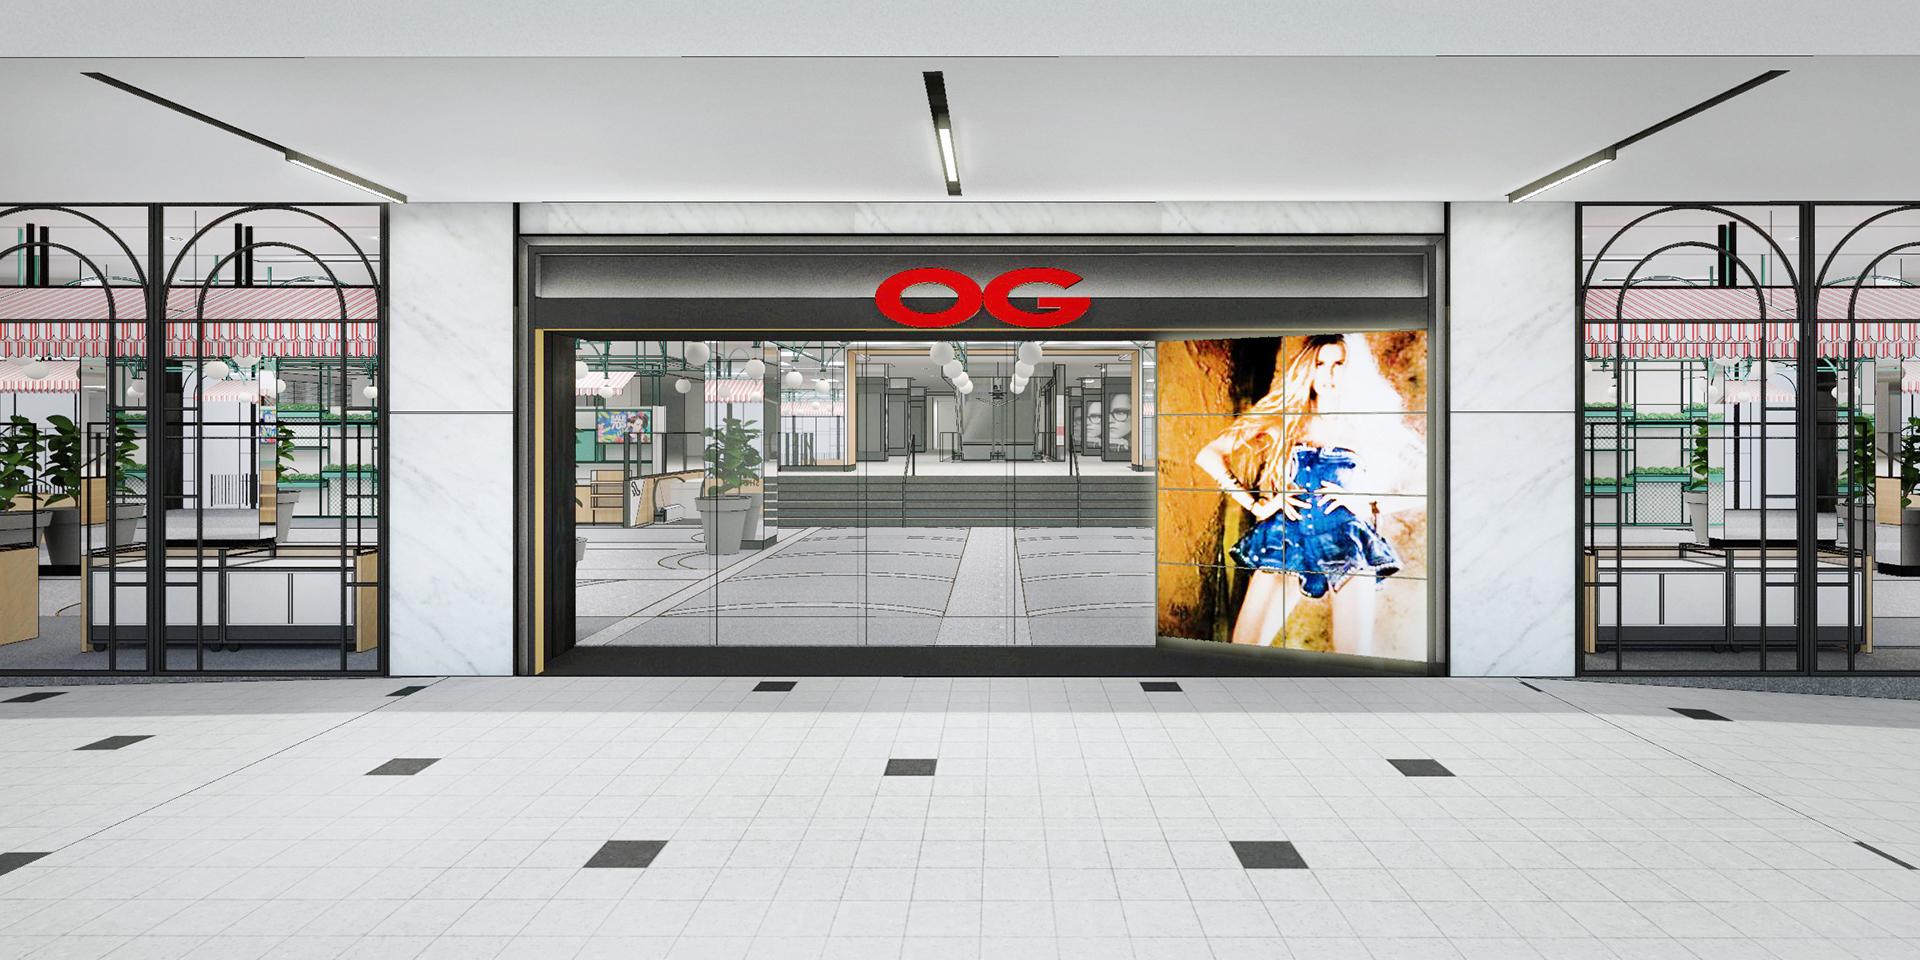 OG Orchard_Slide_HR_2.jpg